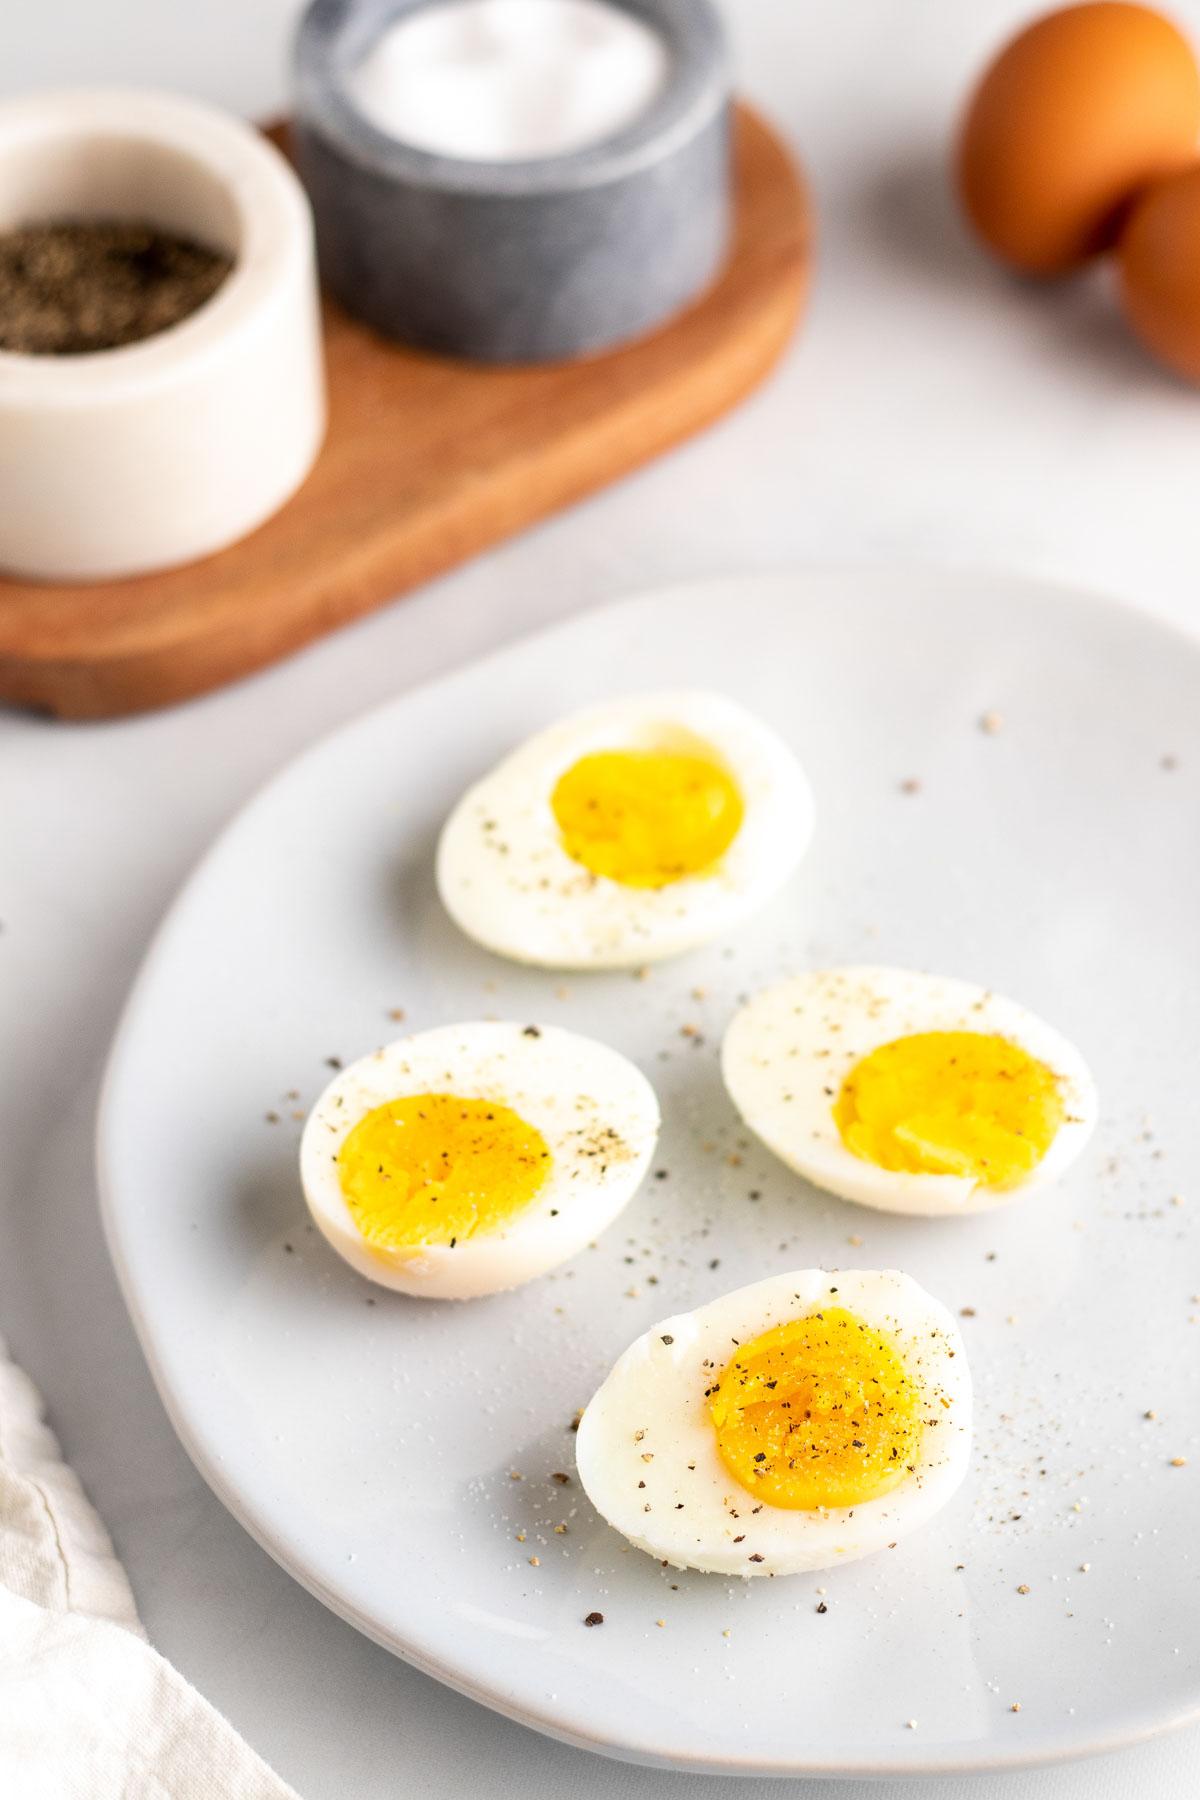 halved hard boiled eggs sprinkled with salt and pepper